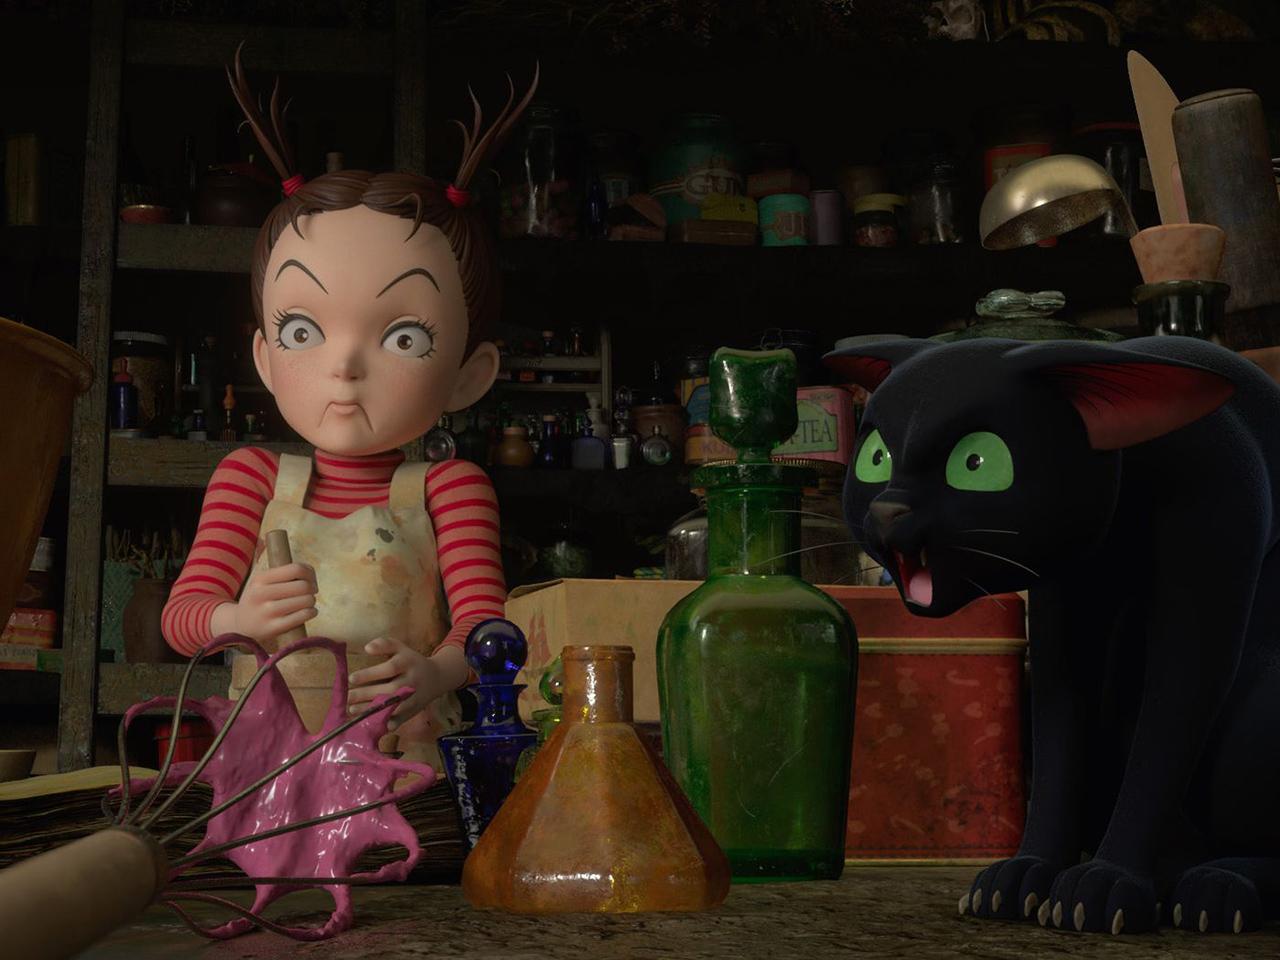 EARWIG AND THE WITCH มหัศจรรย์แม่มดอาย่า แอนิเมชัน 3D เรื่องแรกจาก Studio Glubli